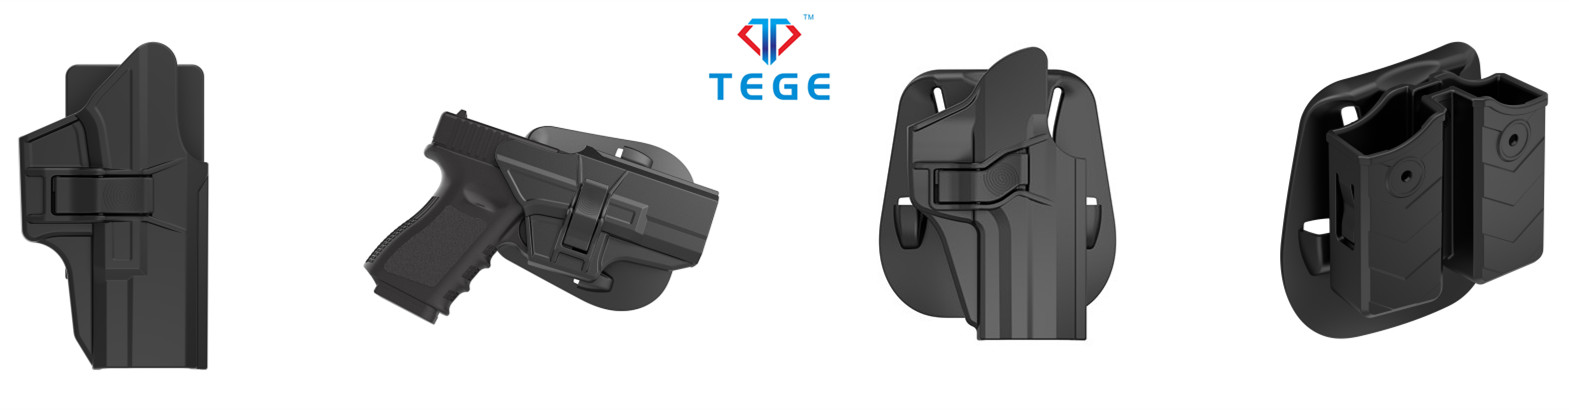 Original polymer high-tech police military civilian self-defense pistol holster for Sig Sauer P320